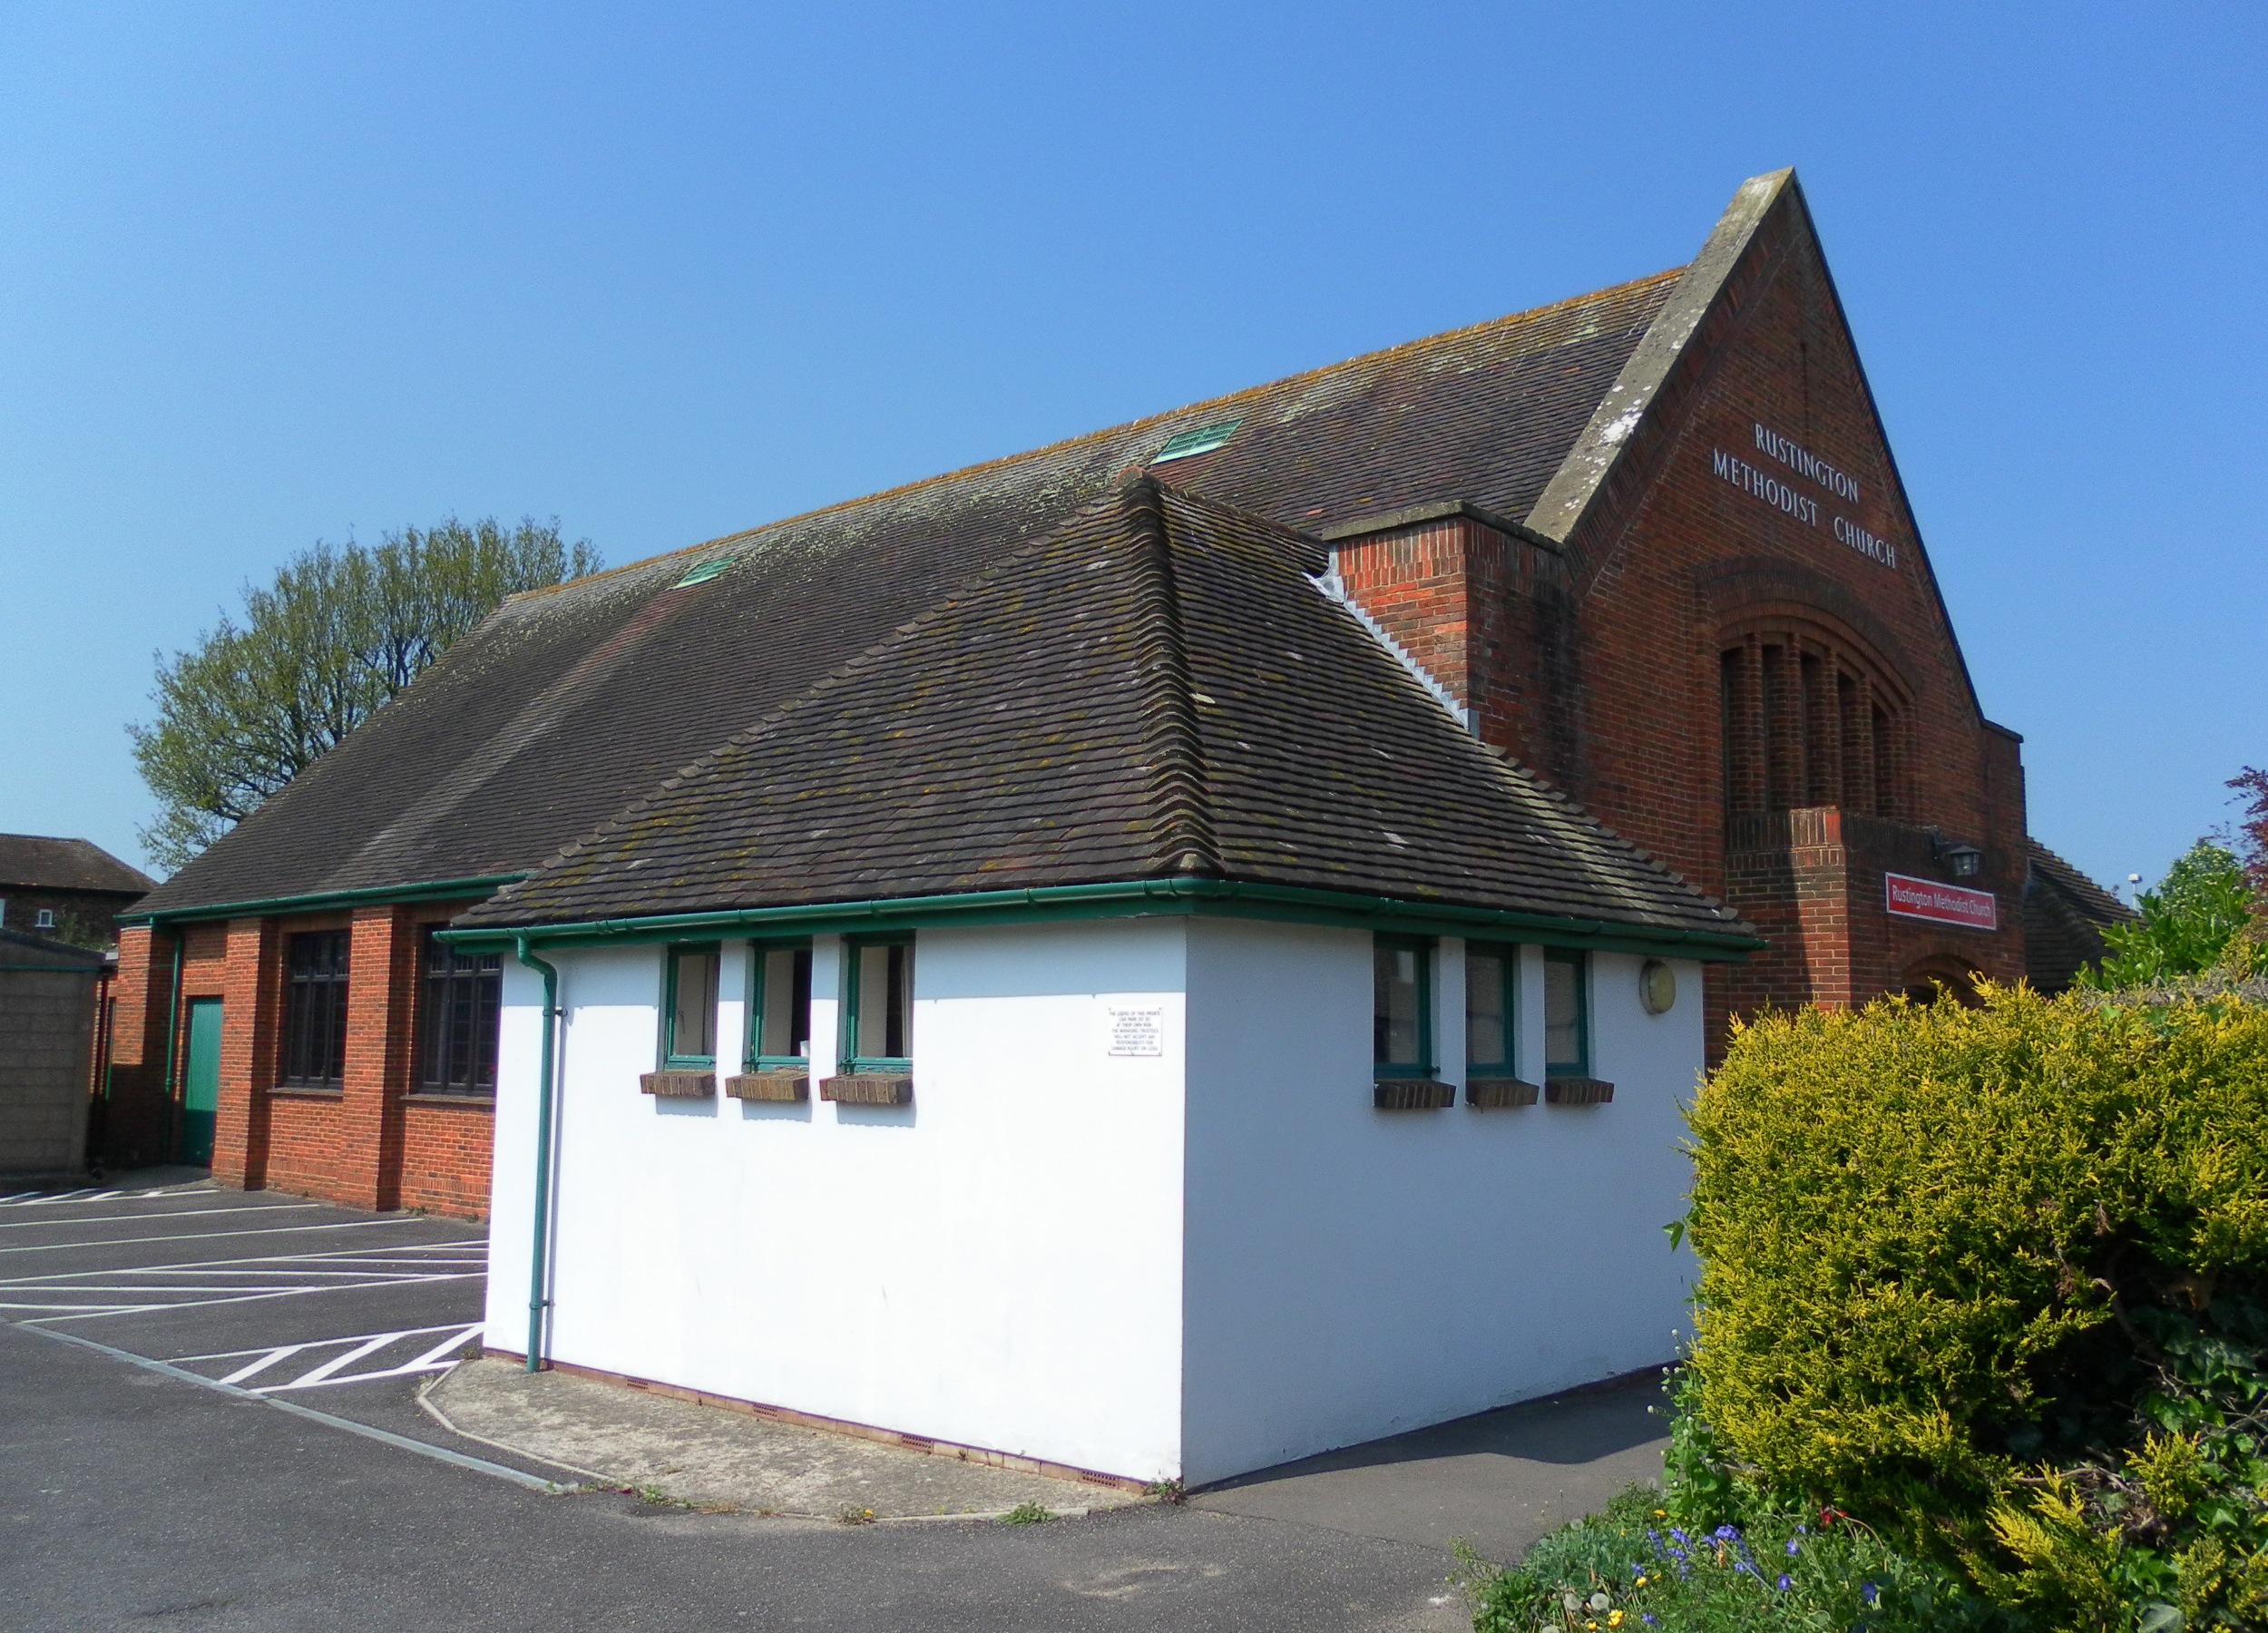 Rustington Methodist Church